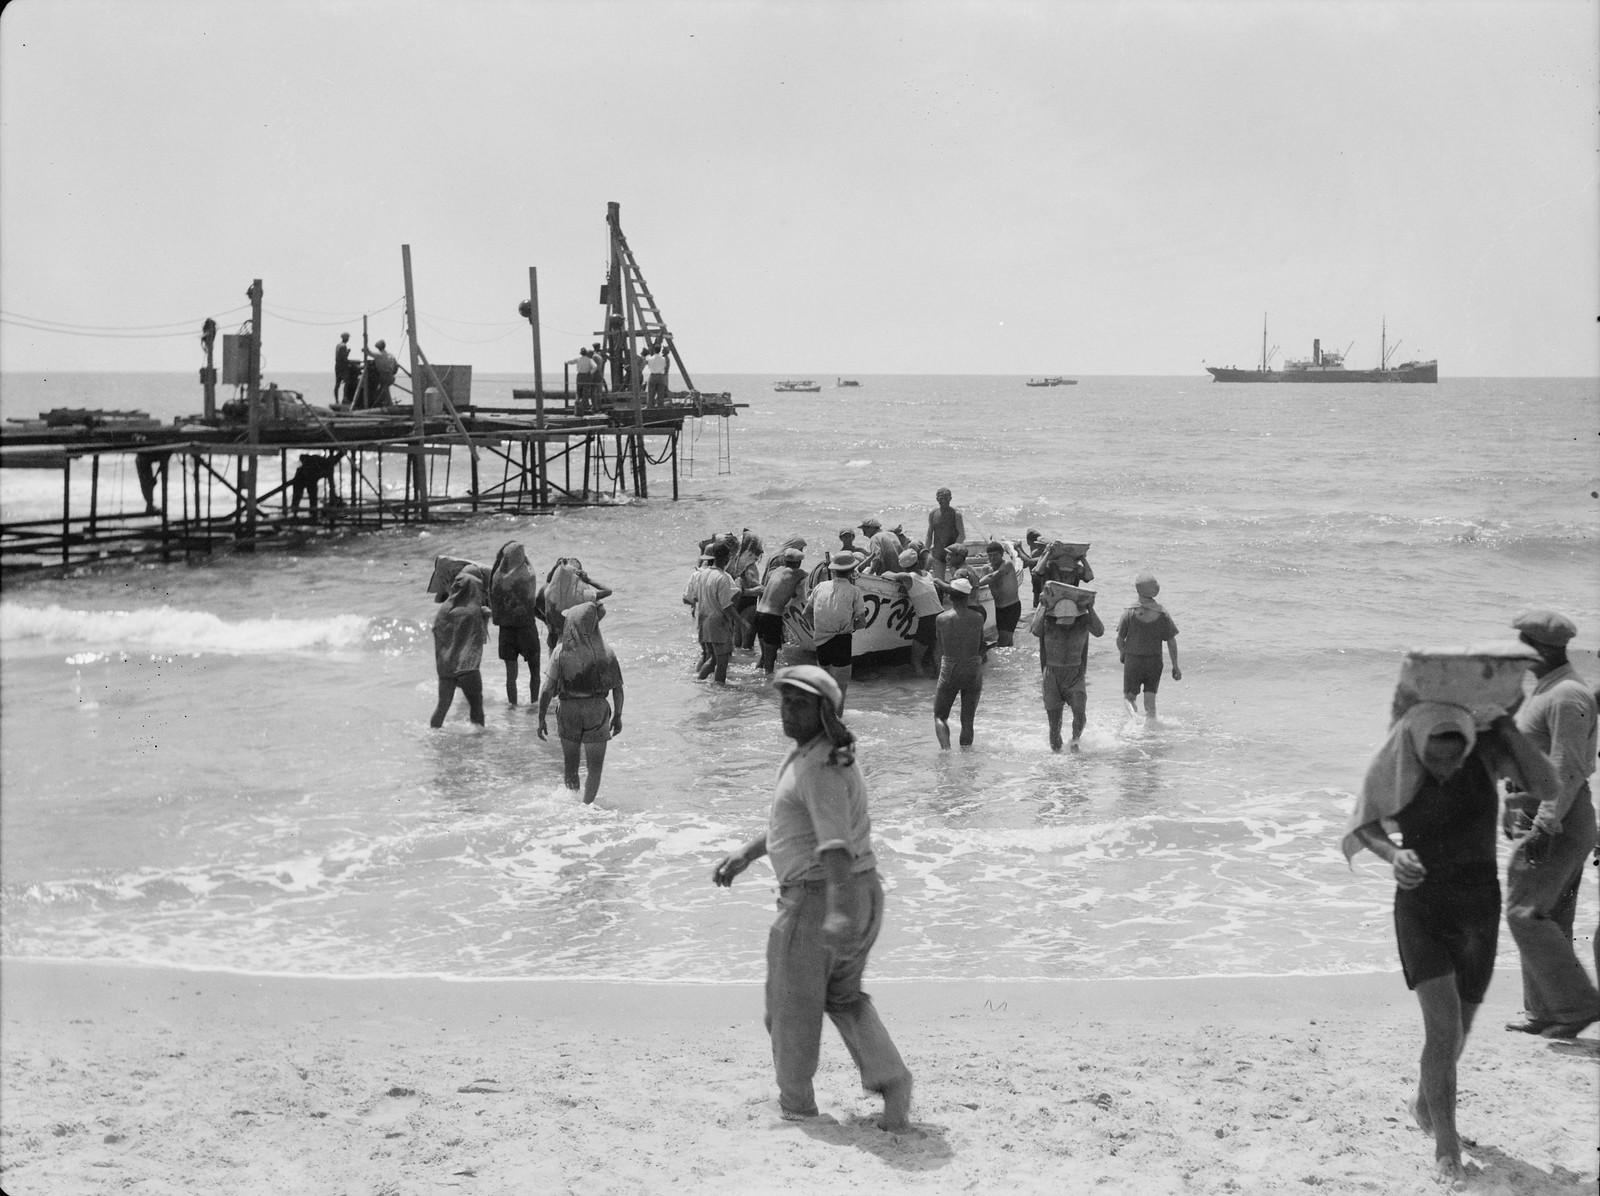 Тель-Авив. Еврейские грузчики выгружают цемент на пристани